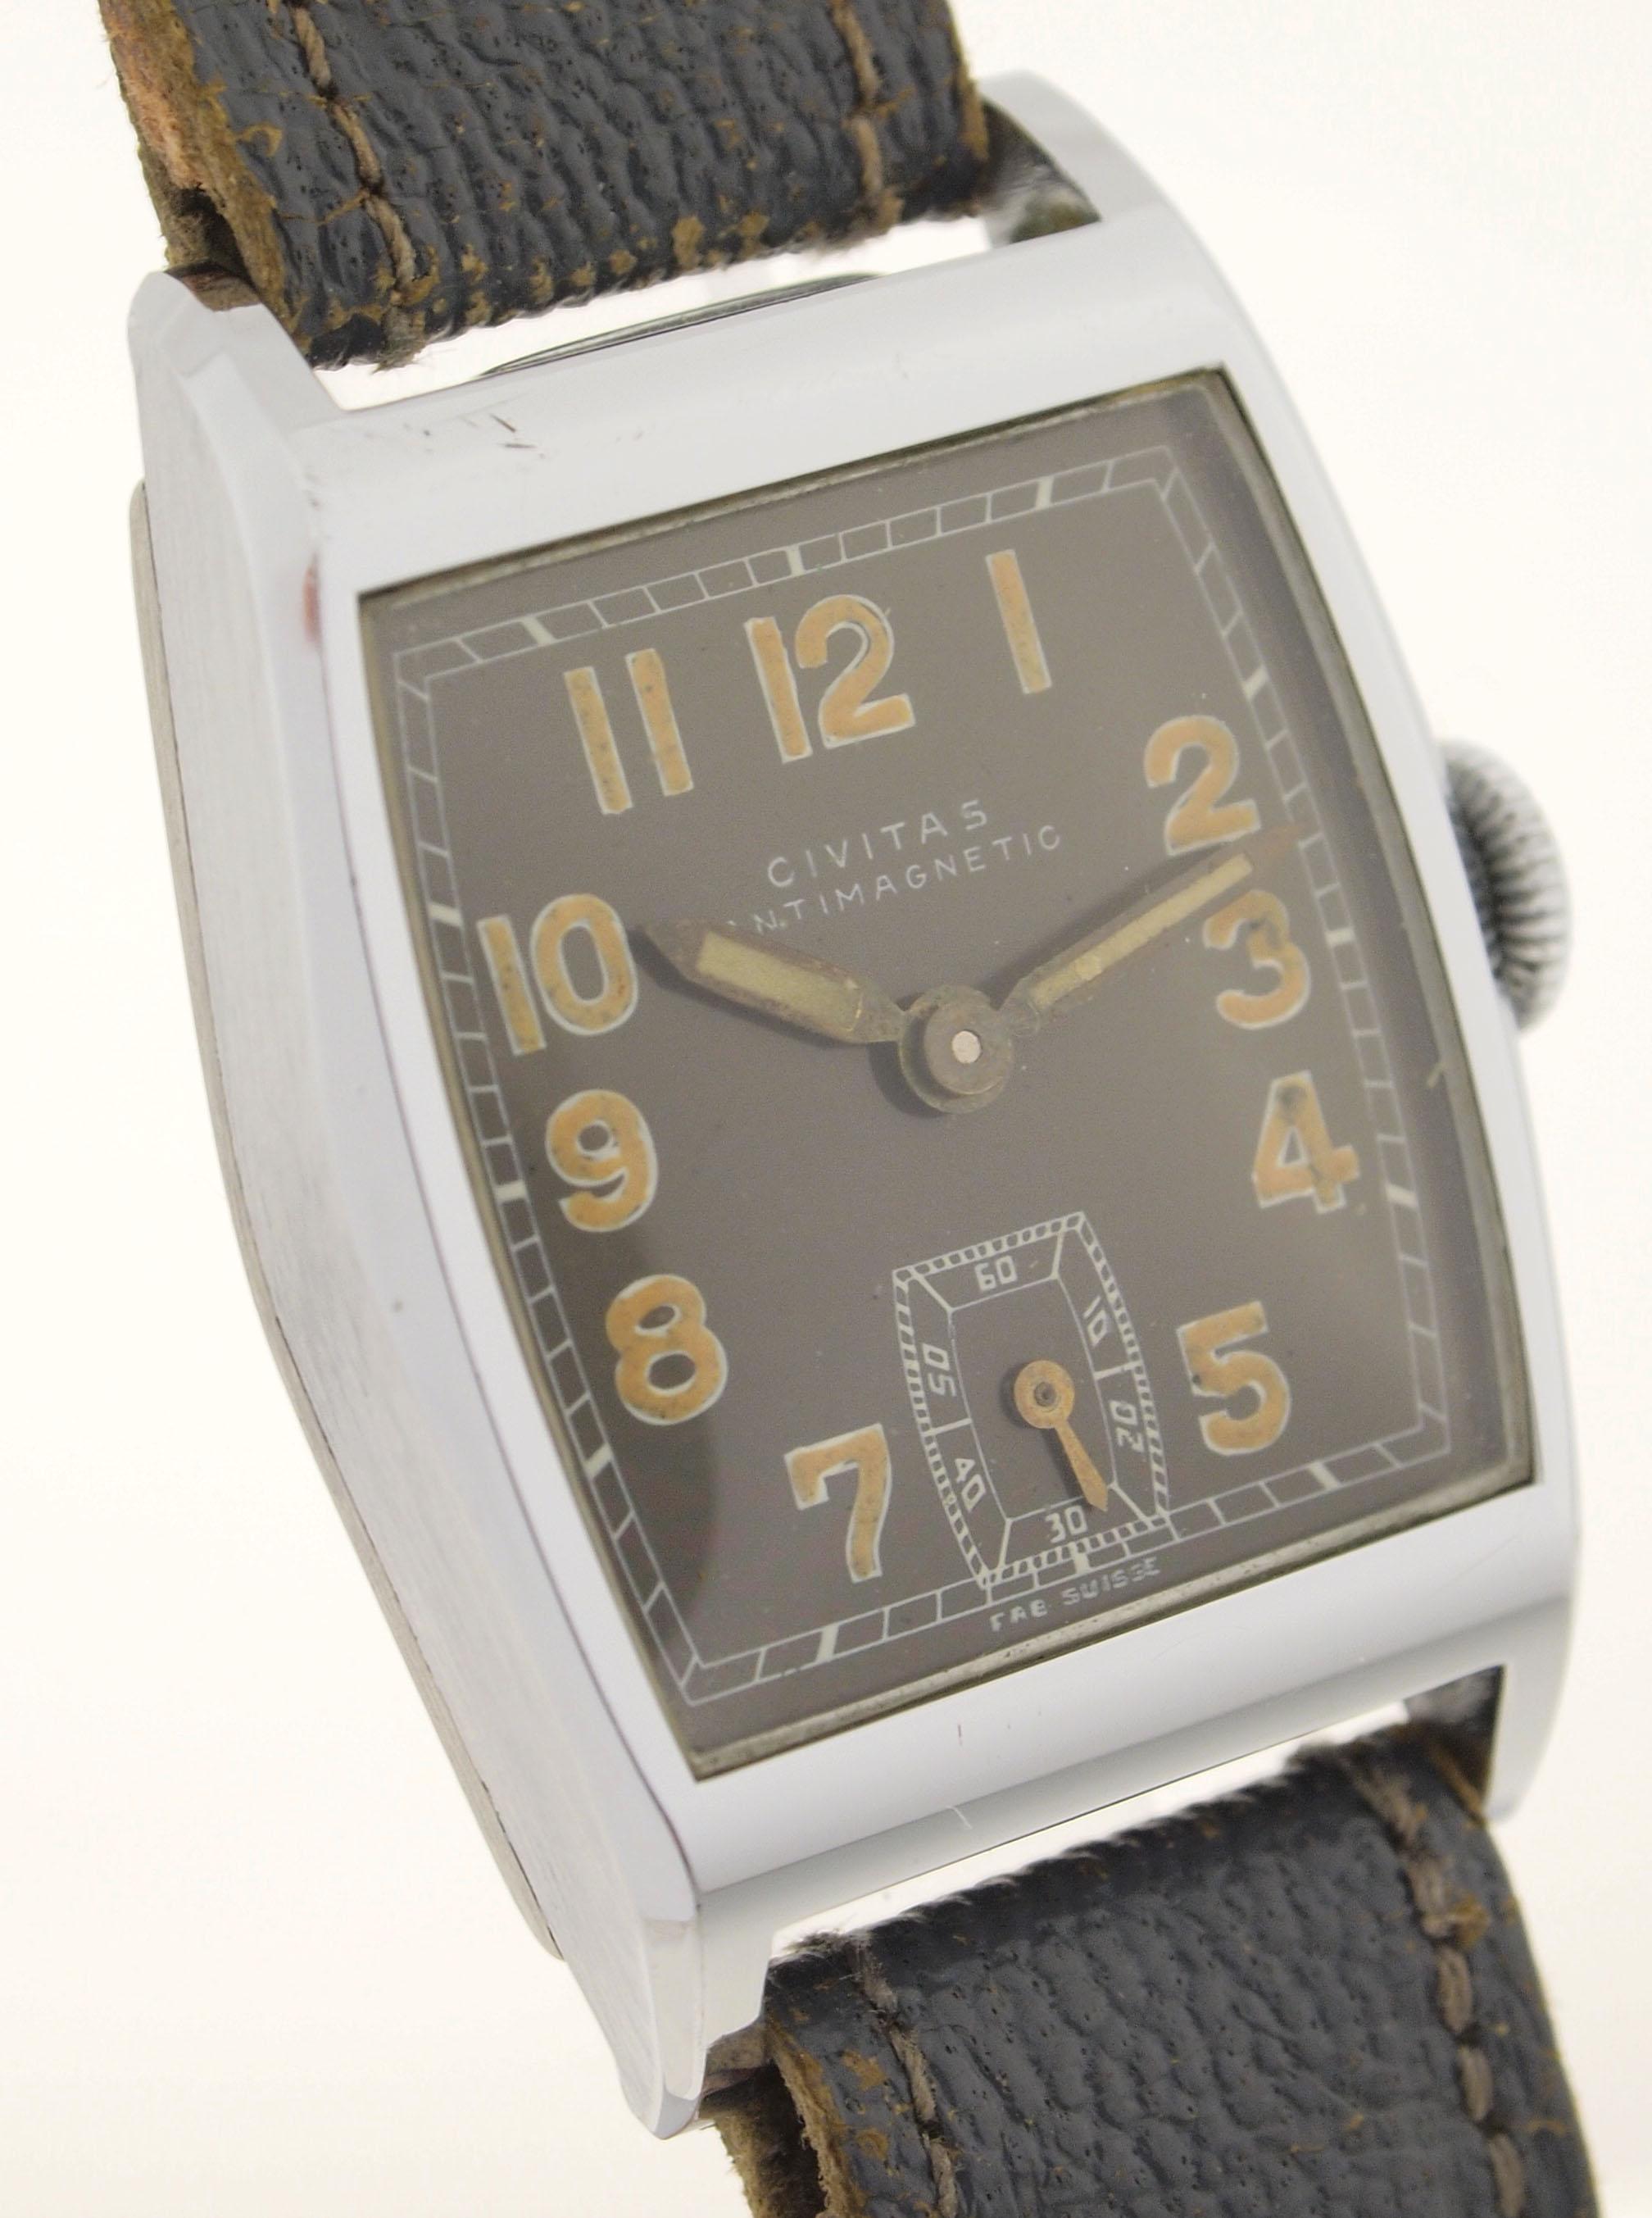 civitas herren armbanduhr in edelstahl art deco uhr aus den 1930er jahren ebay. Black Bedroom Furniture Sets. Home Design Ideas